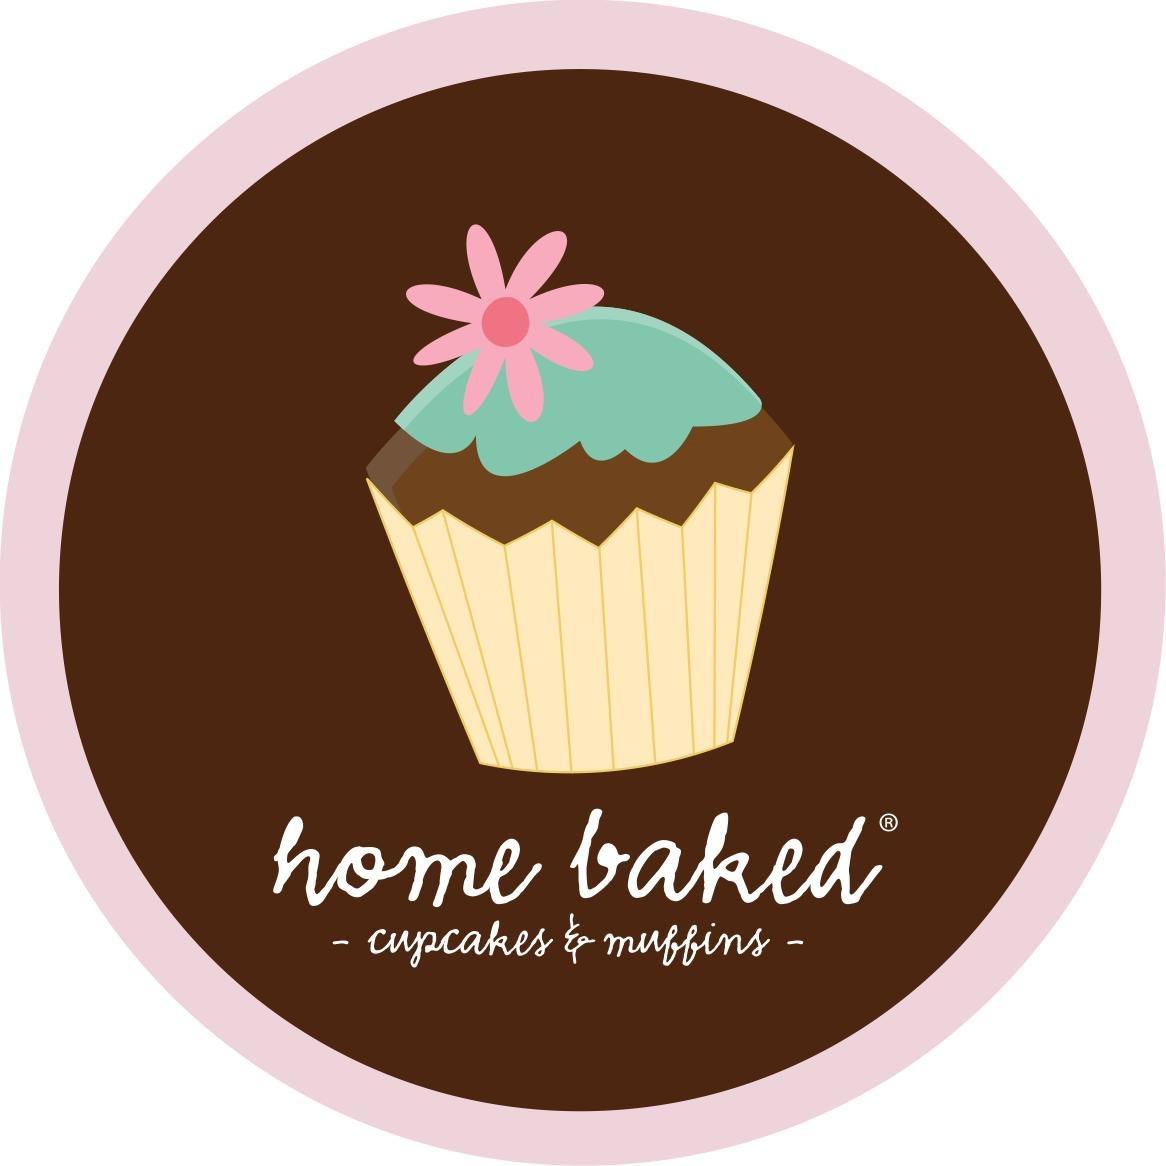 (c) Homebaked.com.co